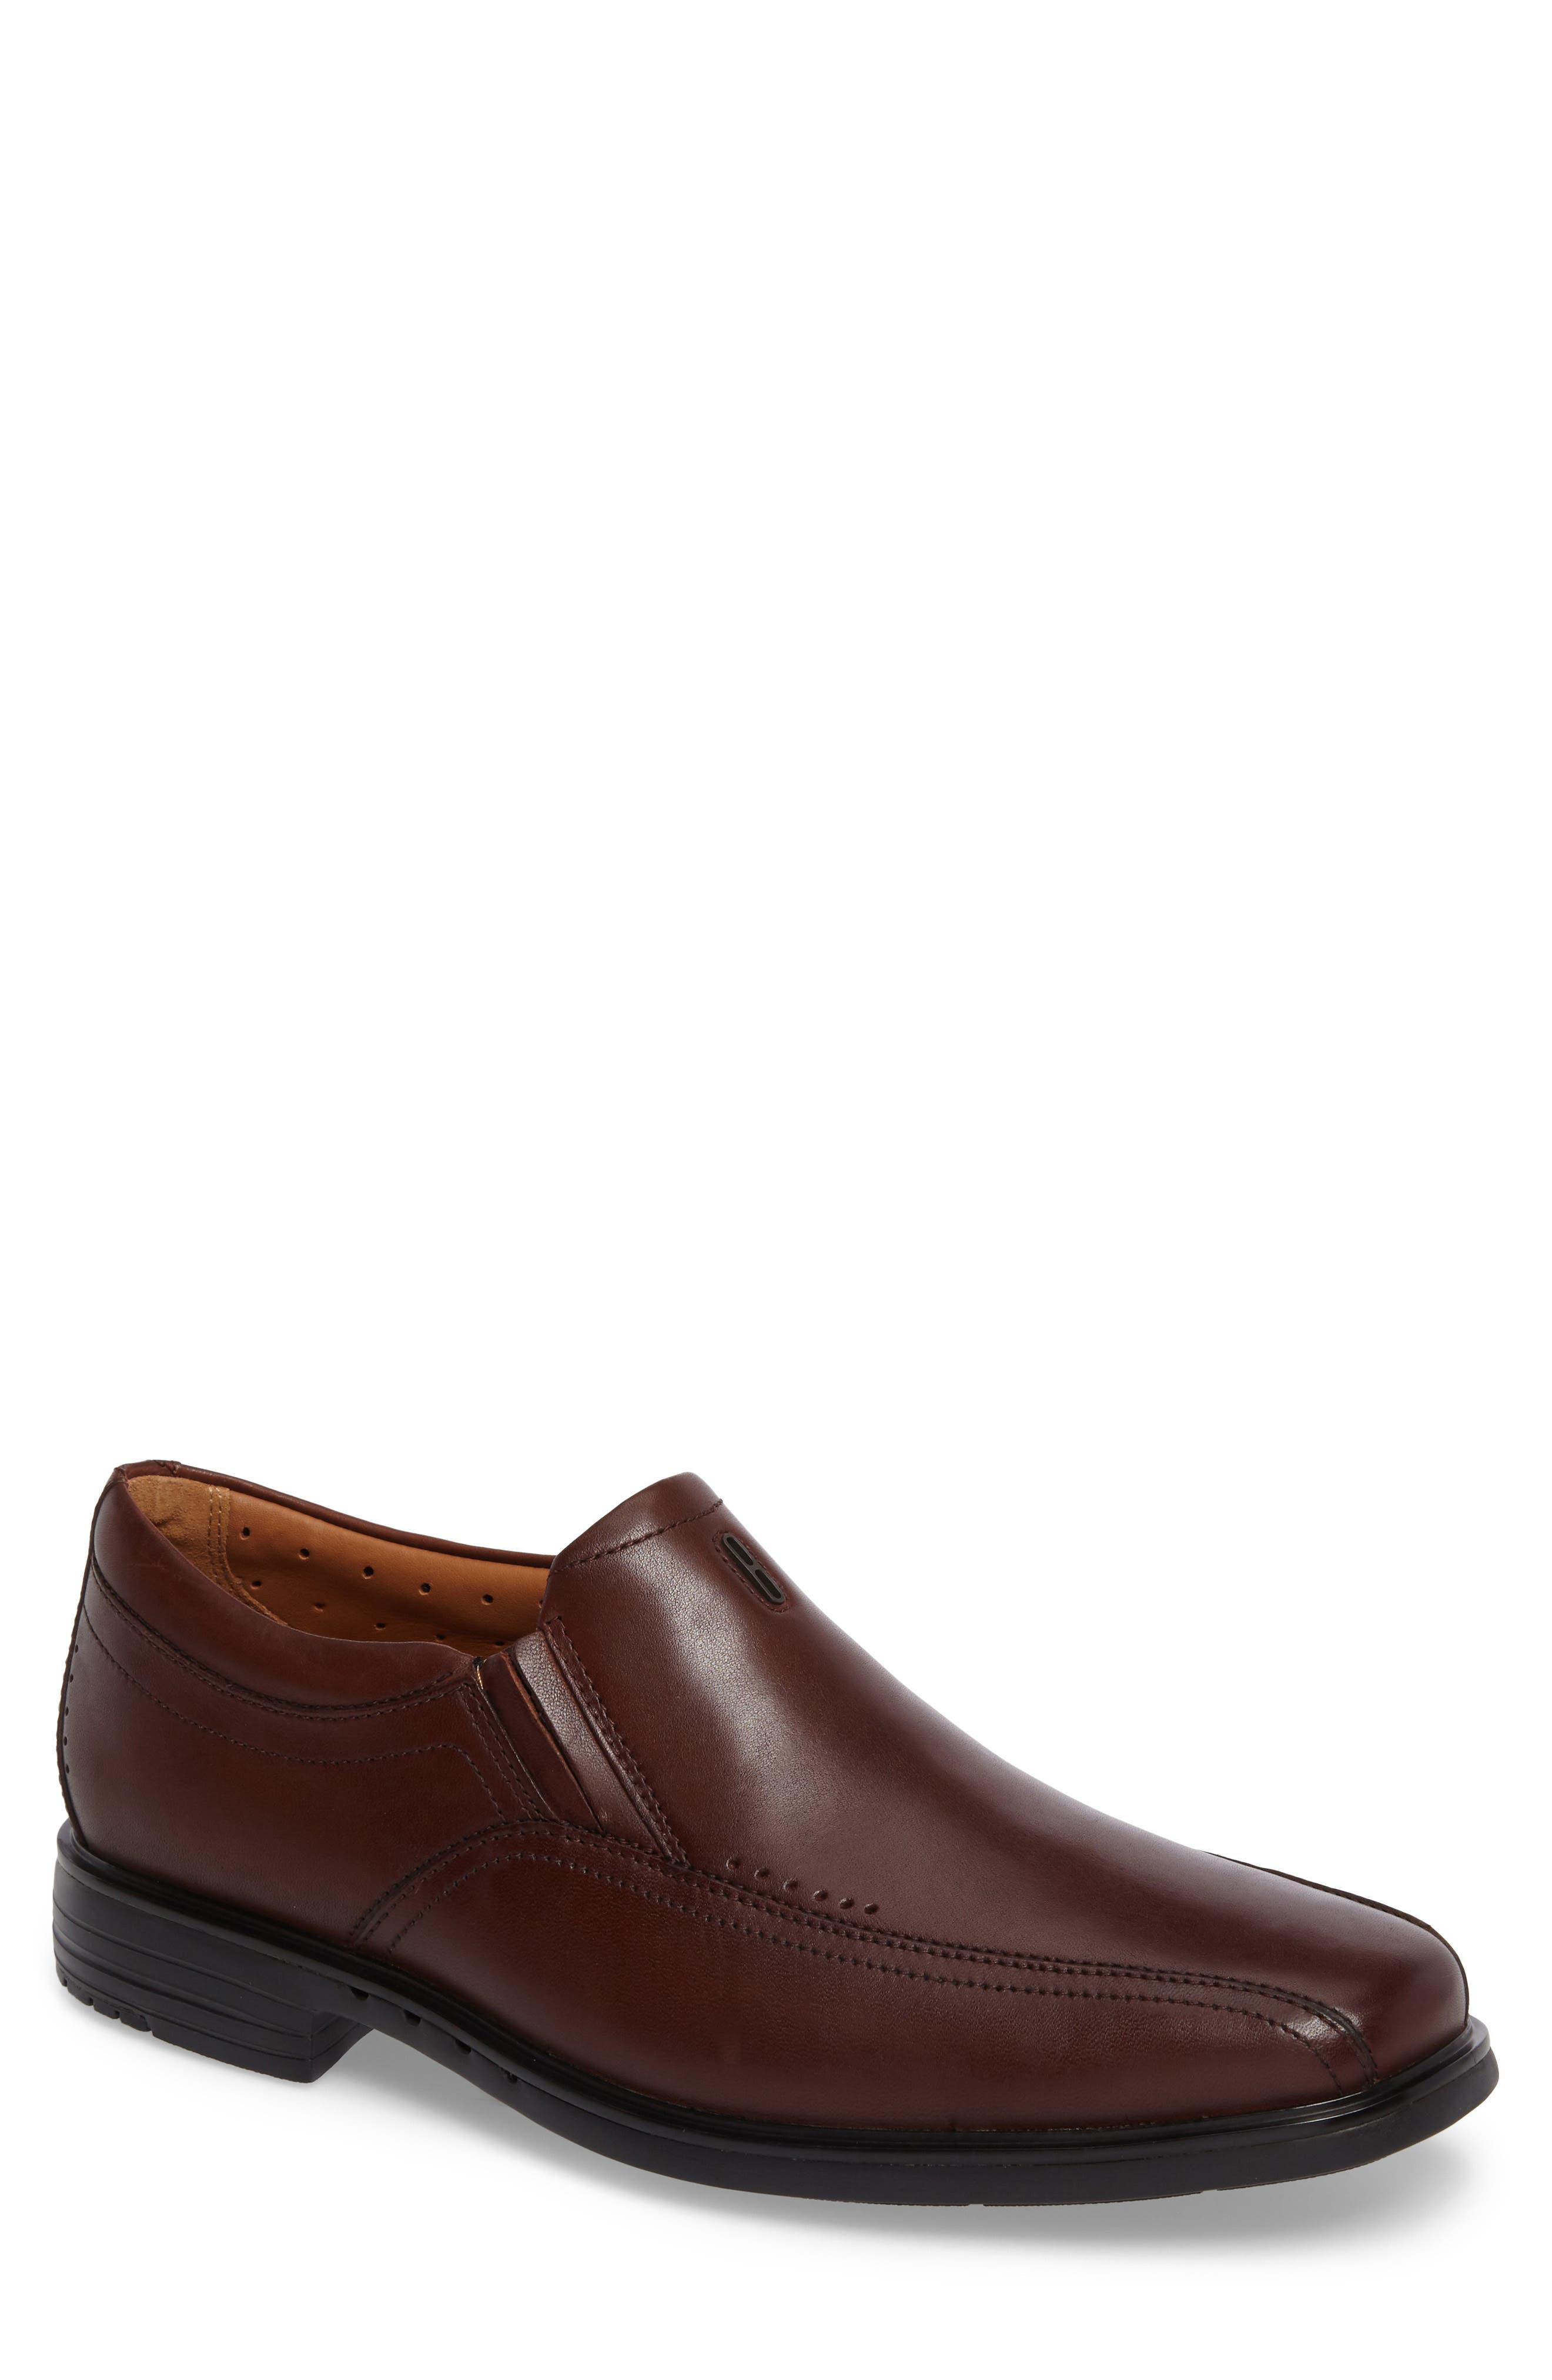 Main Image - Clarks® Un.Sheridan Go Loafer (Men). Black Leather ...